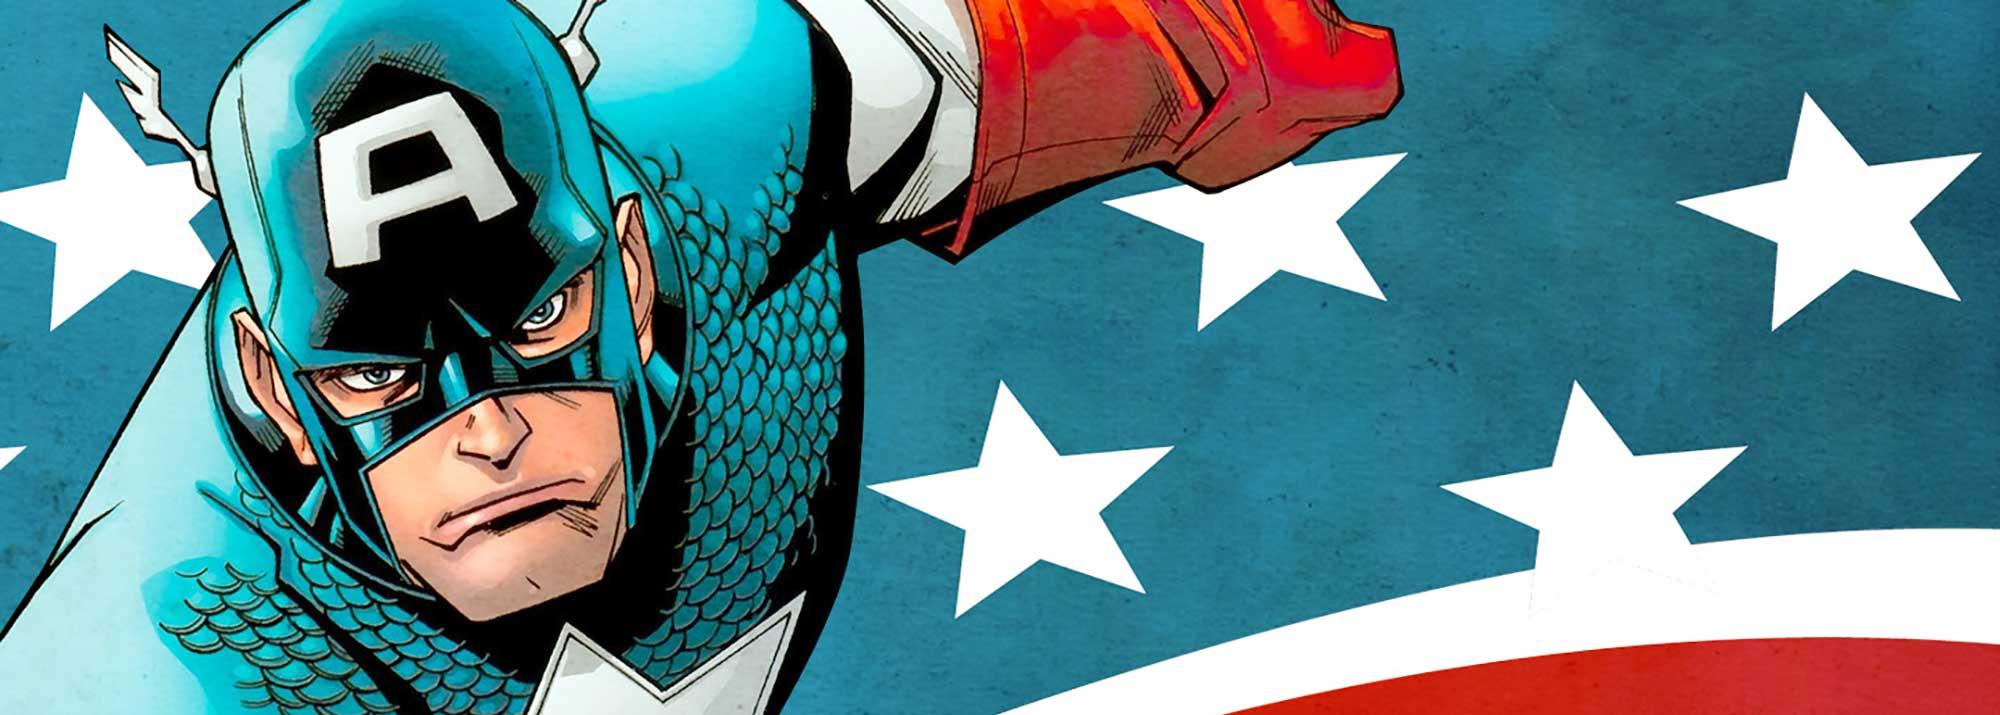 Capitan America dibujos para colorear